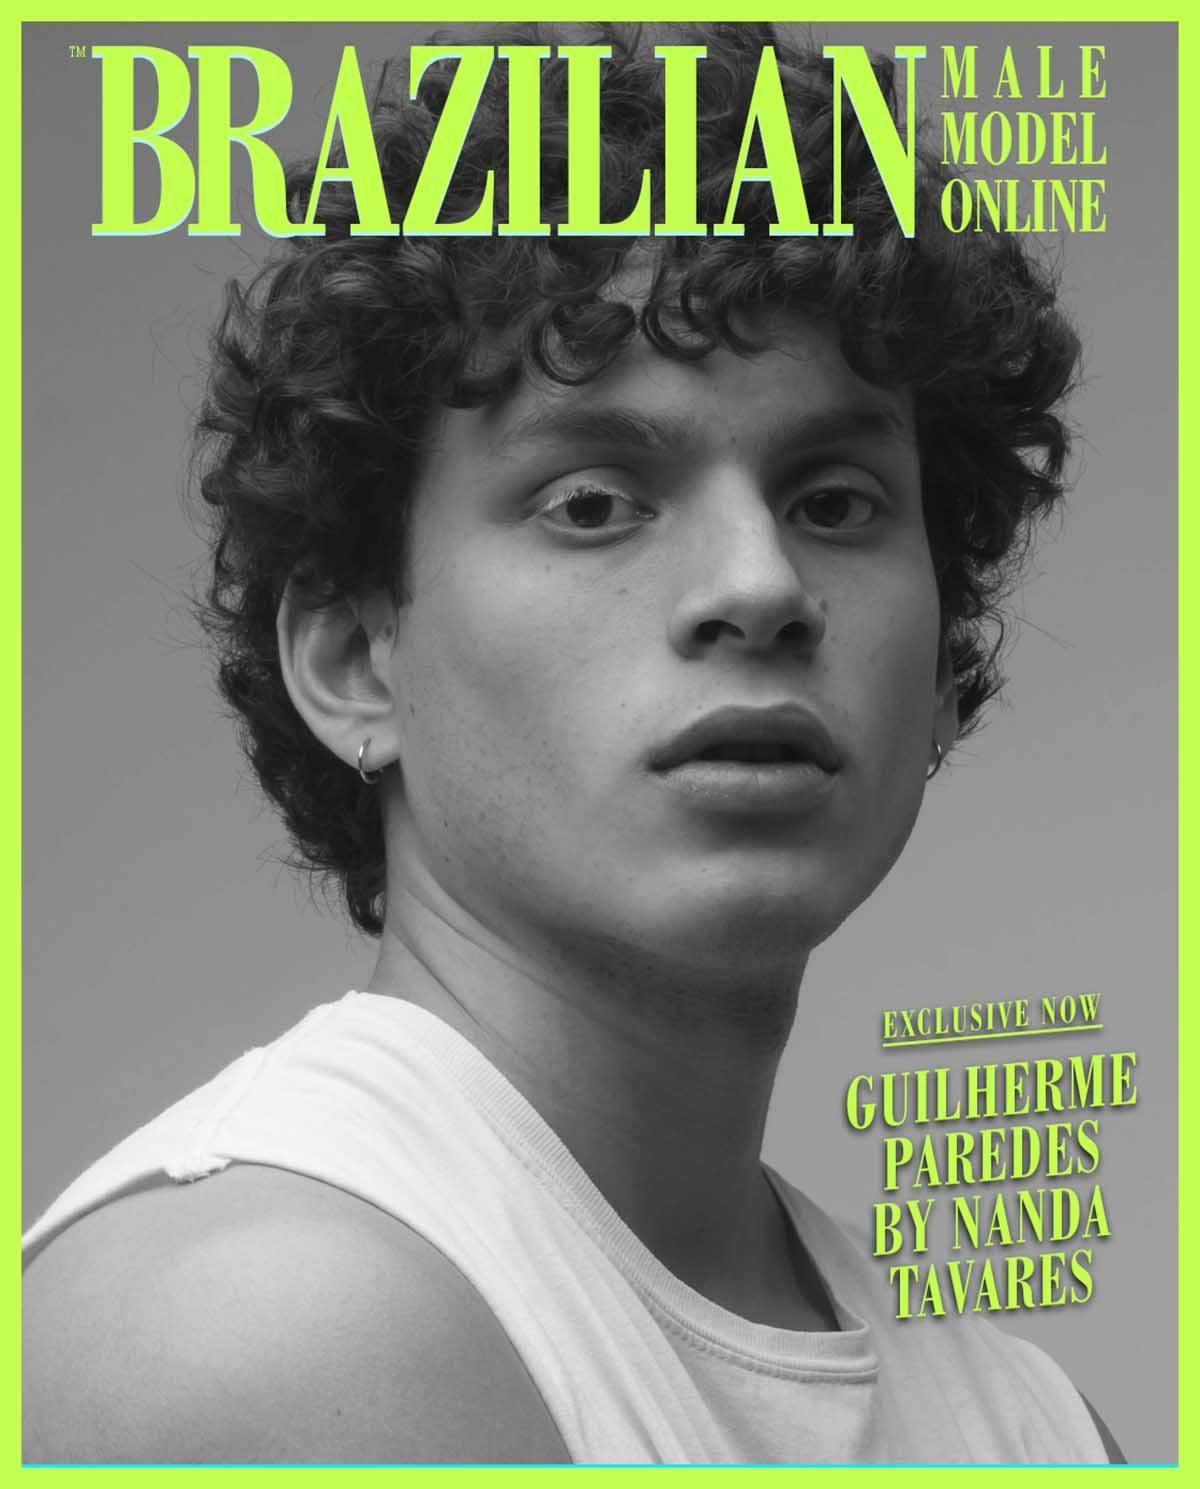 Guilherme Paredes by Nanda Tavares